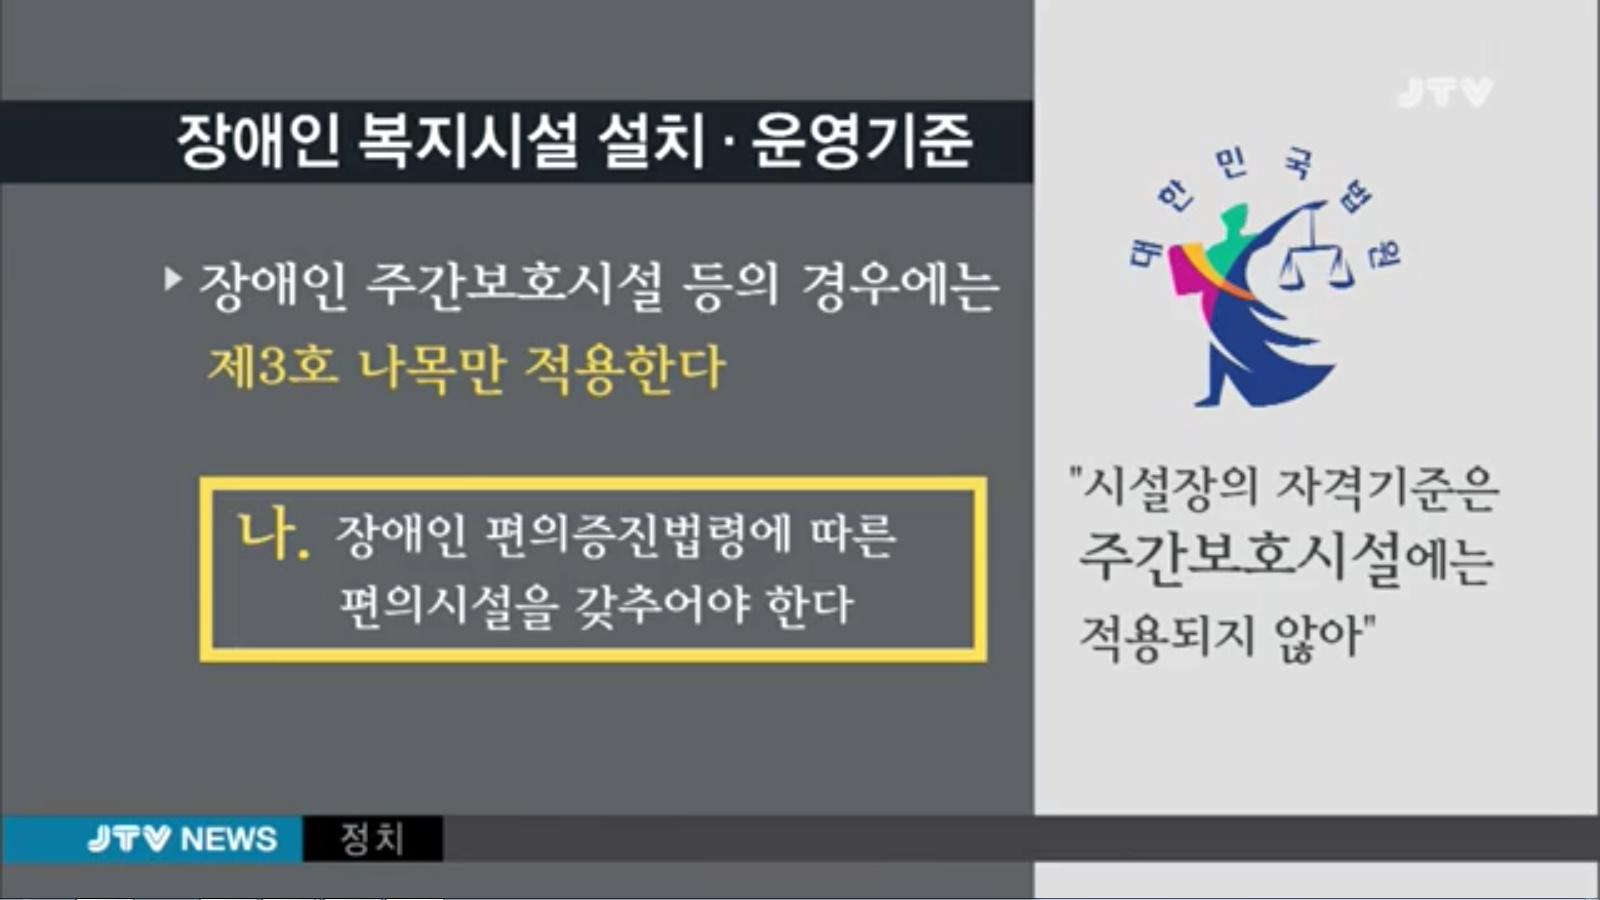 [18.7.25 JTV] 전주 봉침게이트, 검찰은 기소축소 법원은 재판거래... 의혹22.jpg